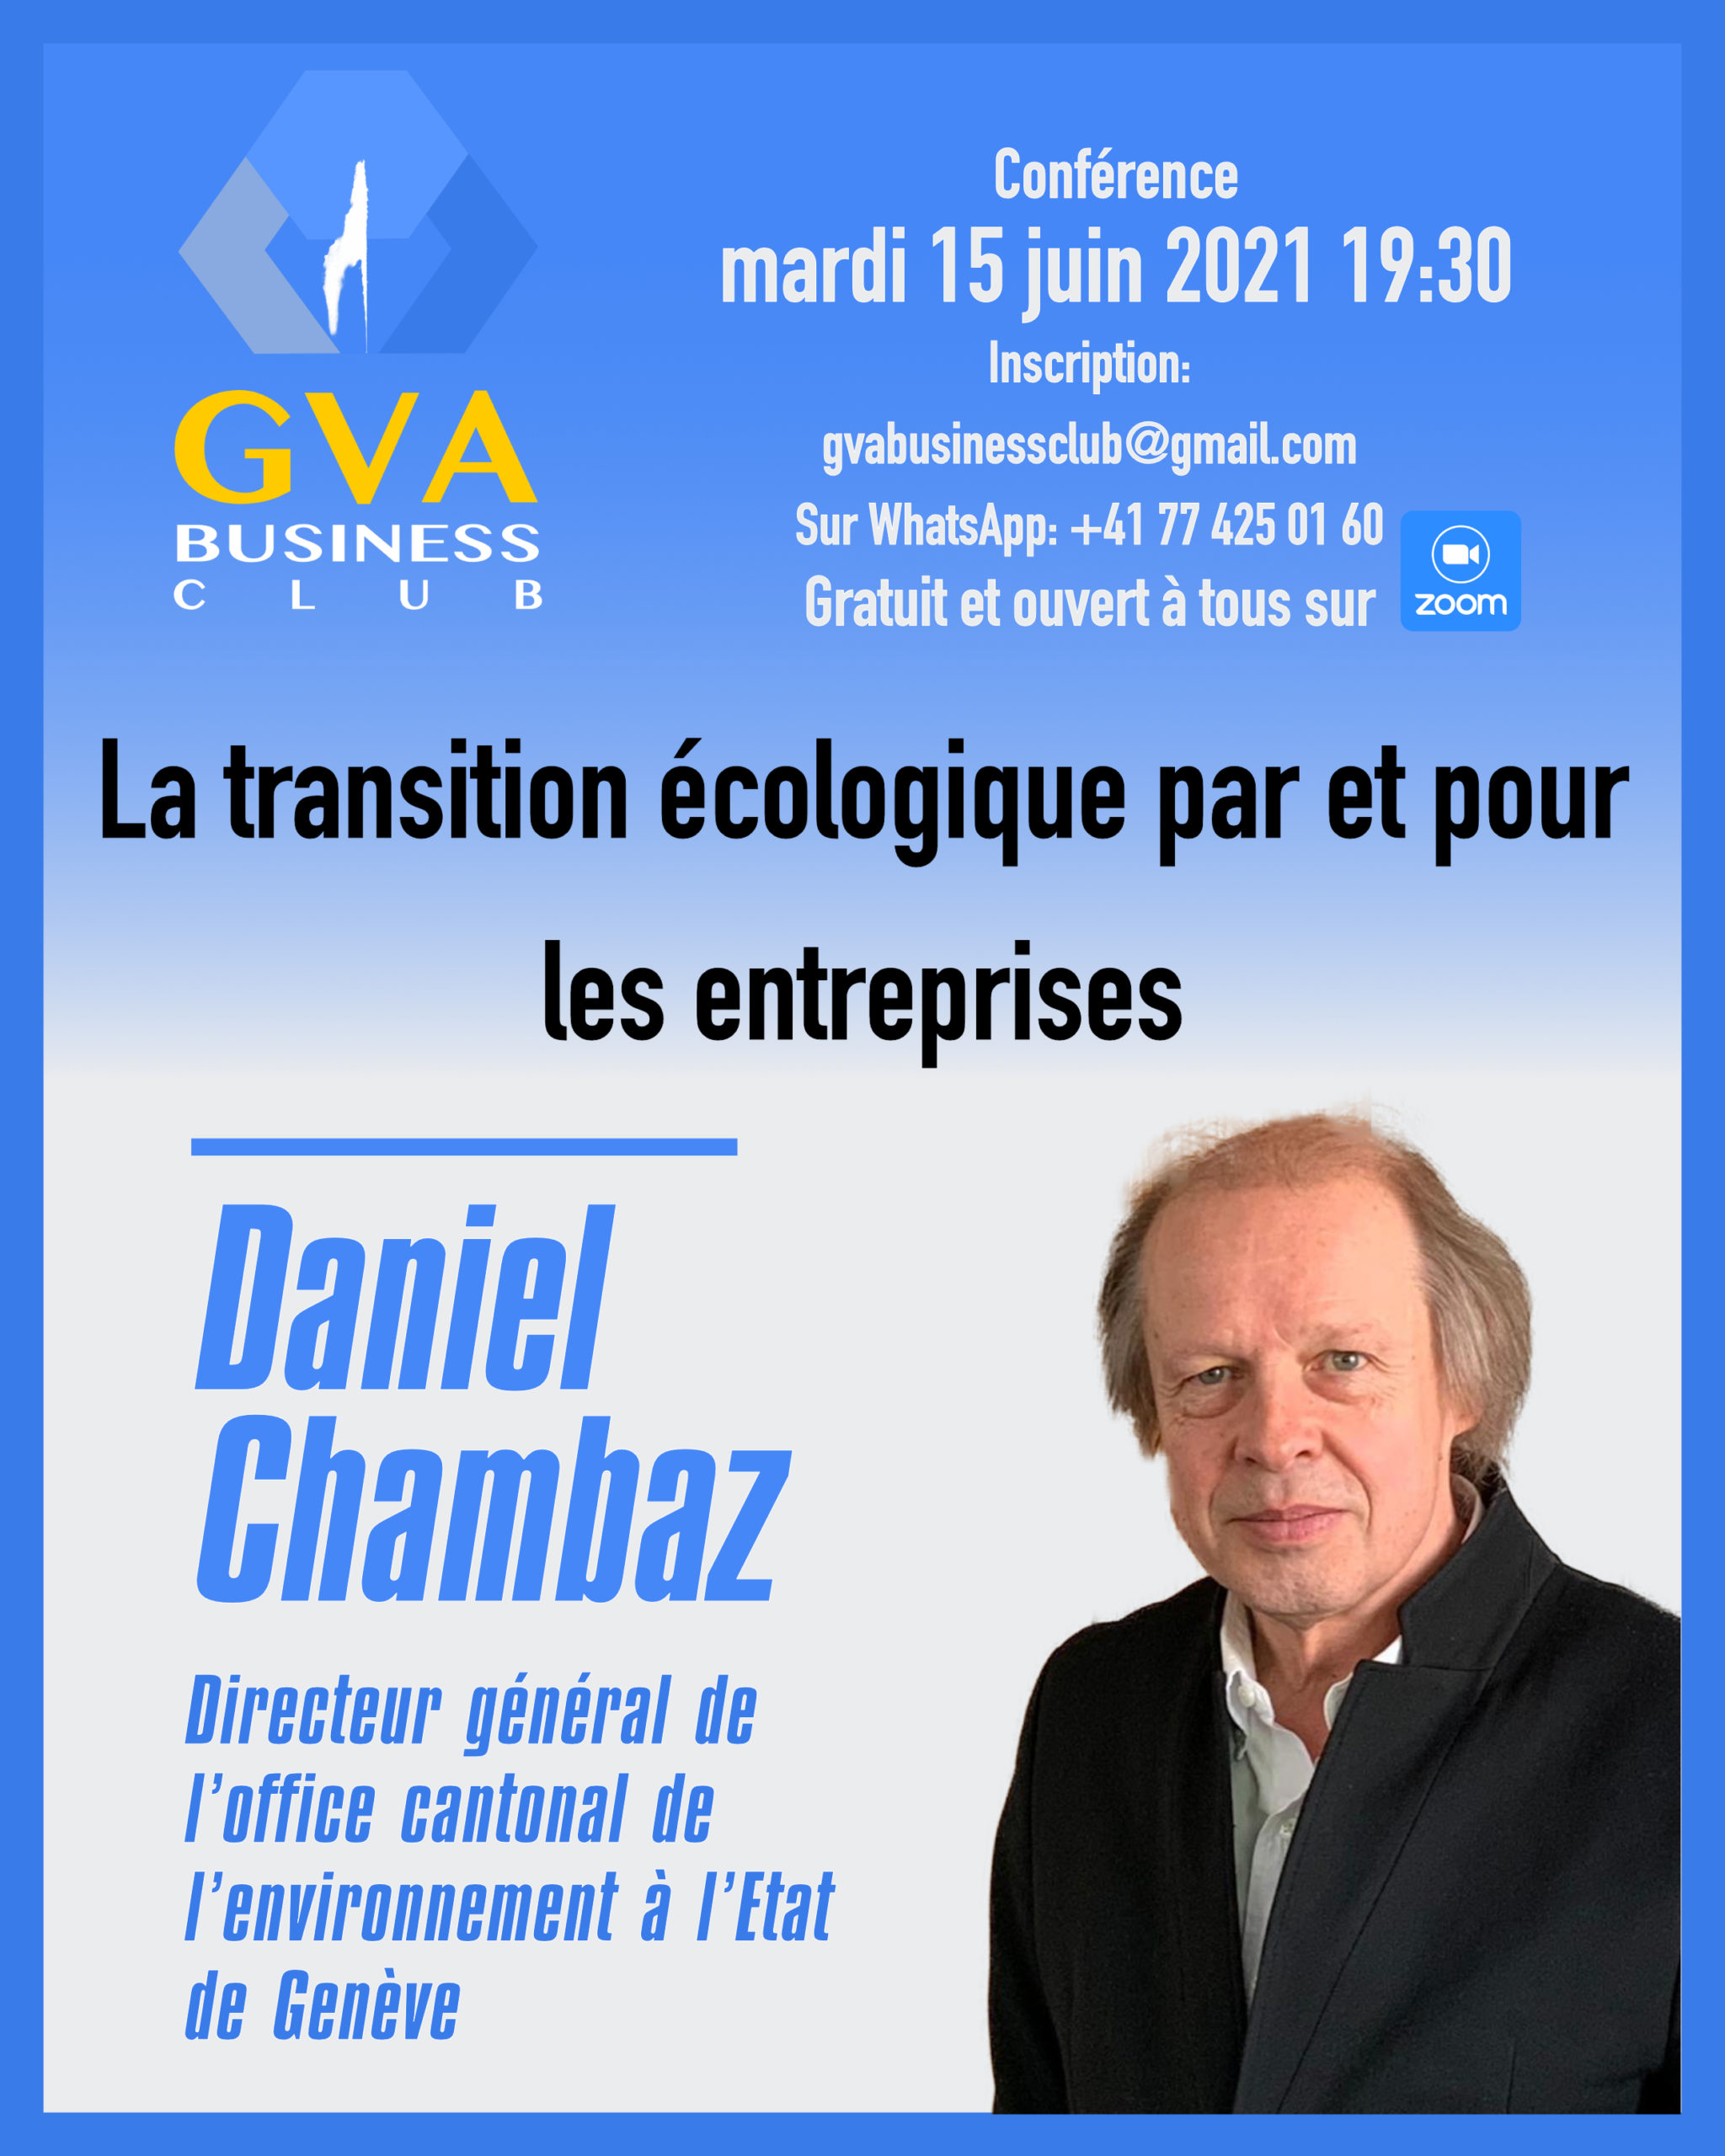 GVA Business Club Daniel Chambaz